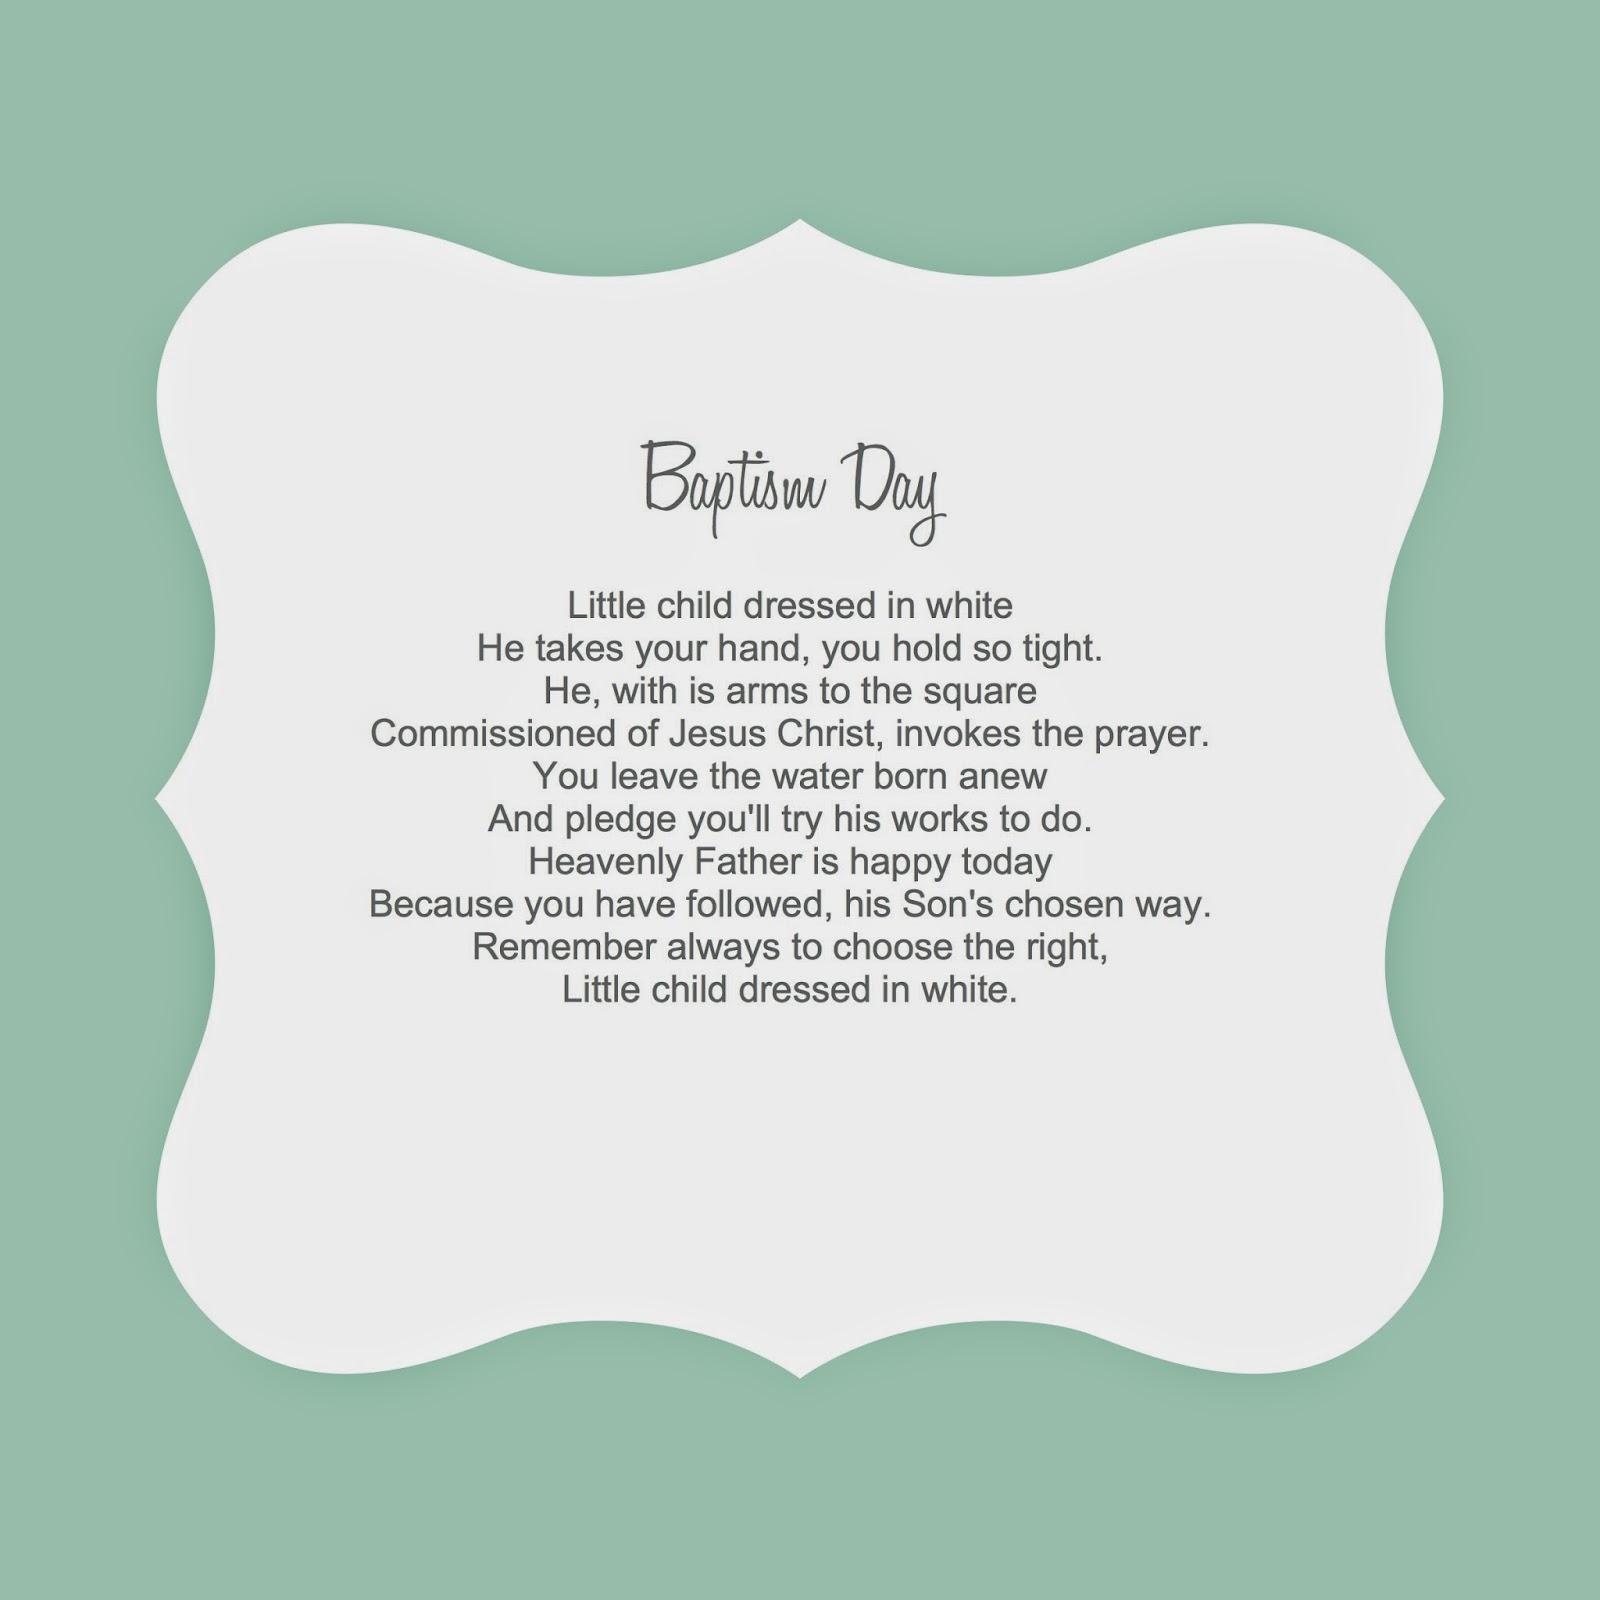 One Baptism in Ephesians 4:5